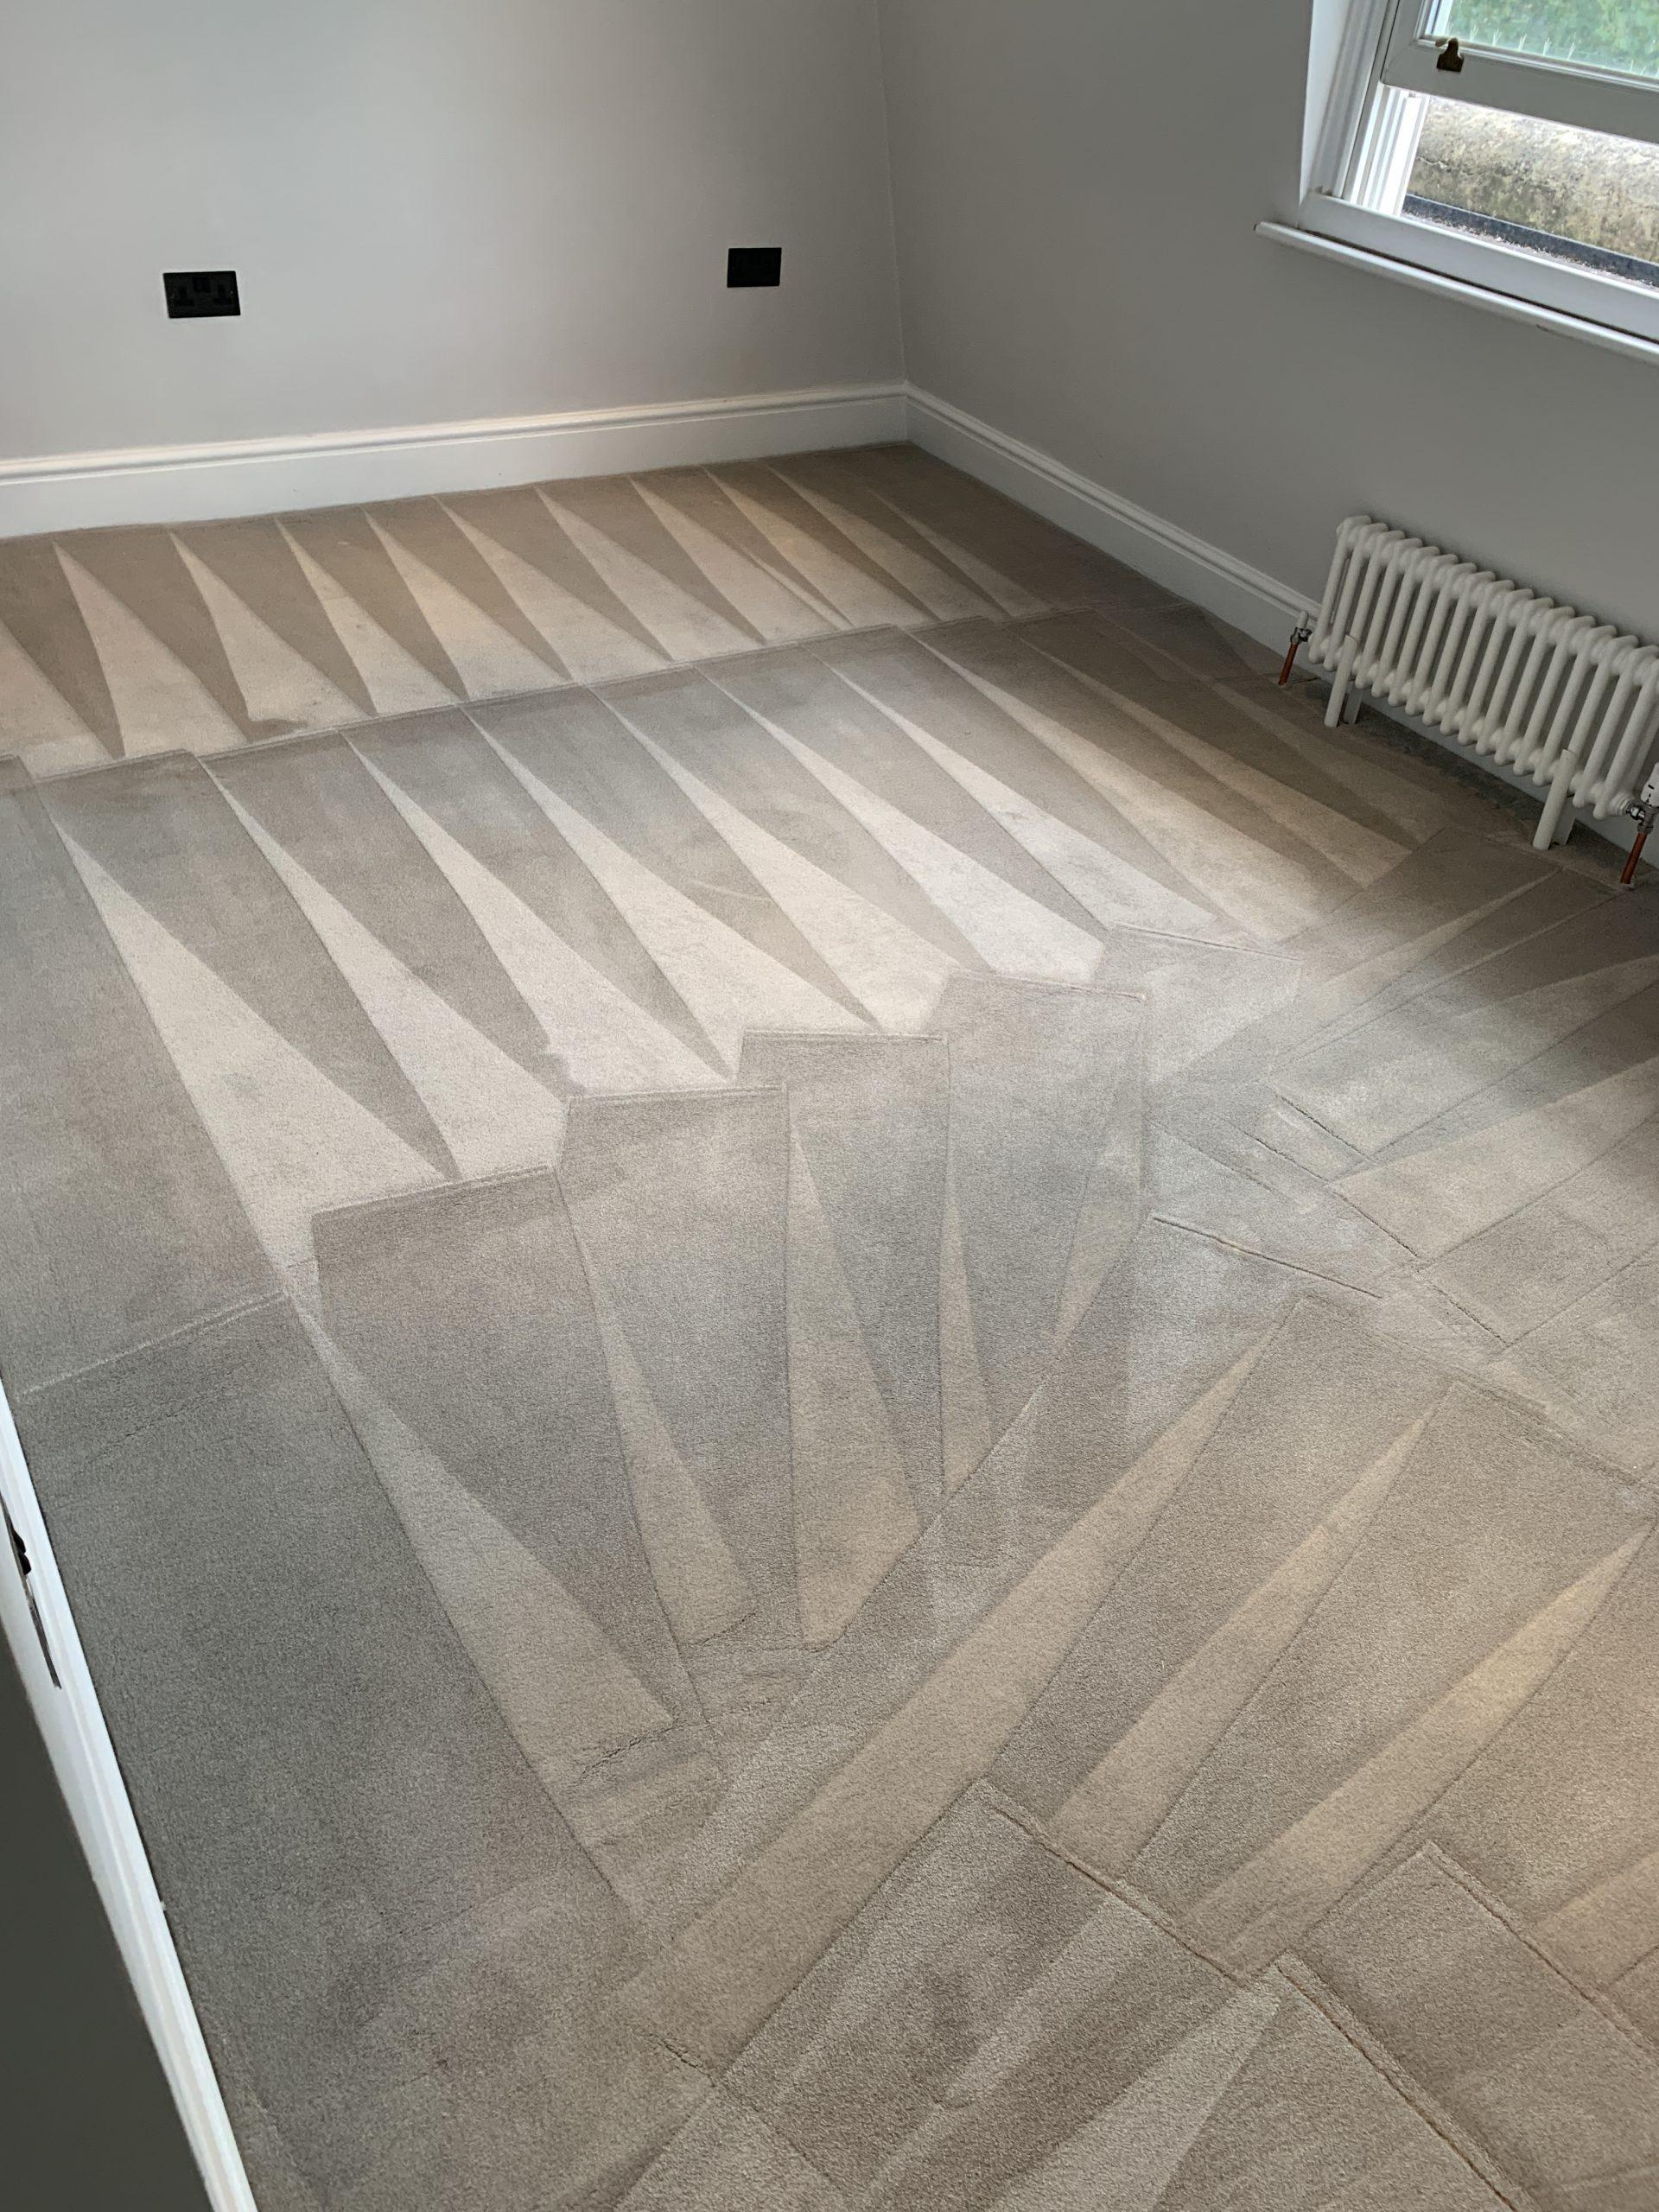 carpet cleaning Acton - Supreme Furnishings